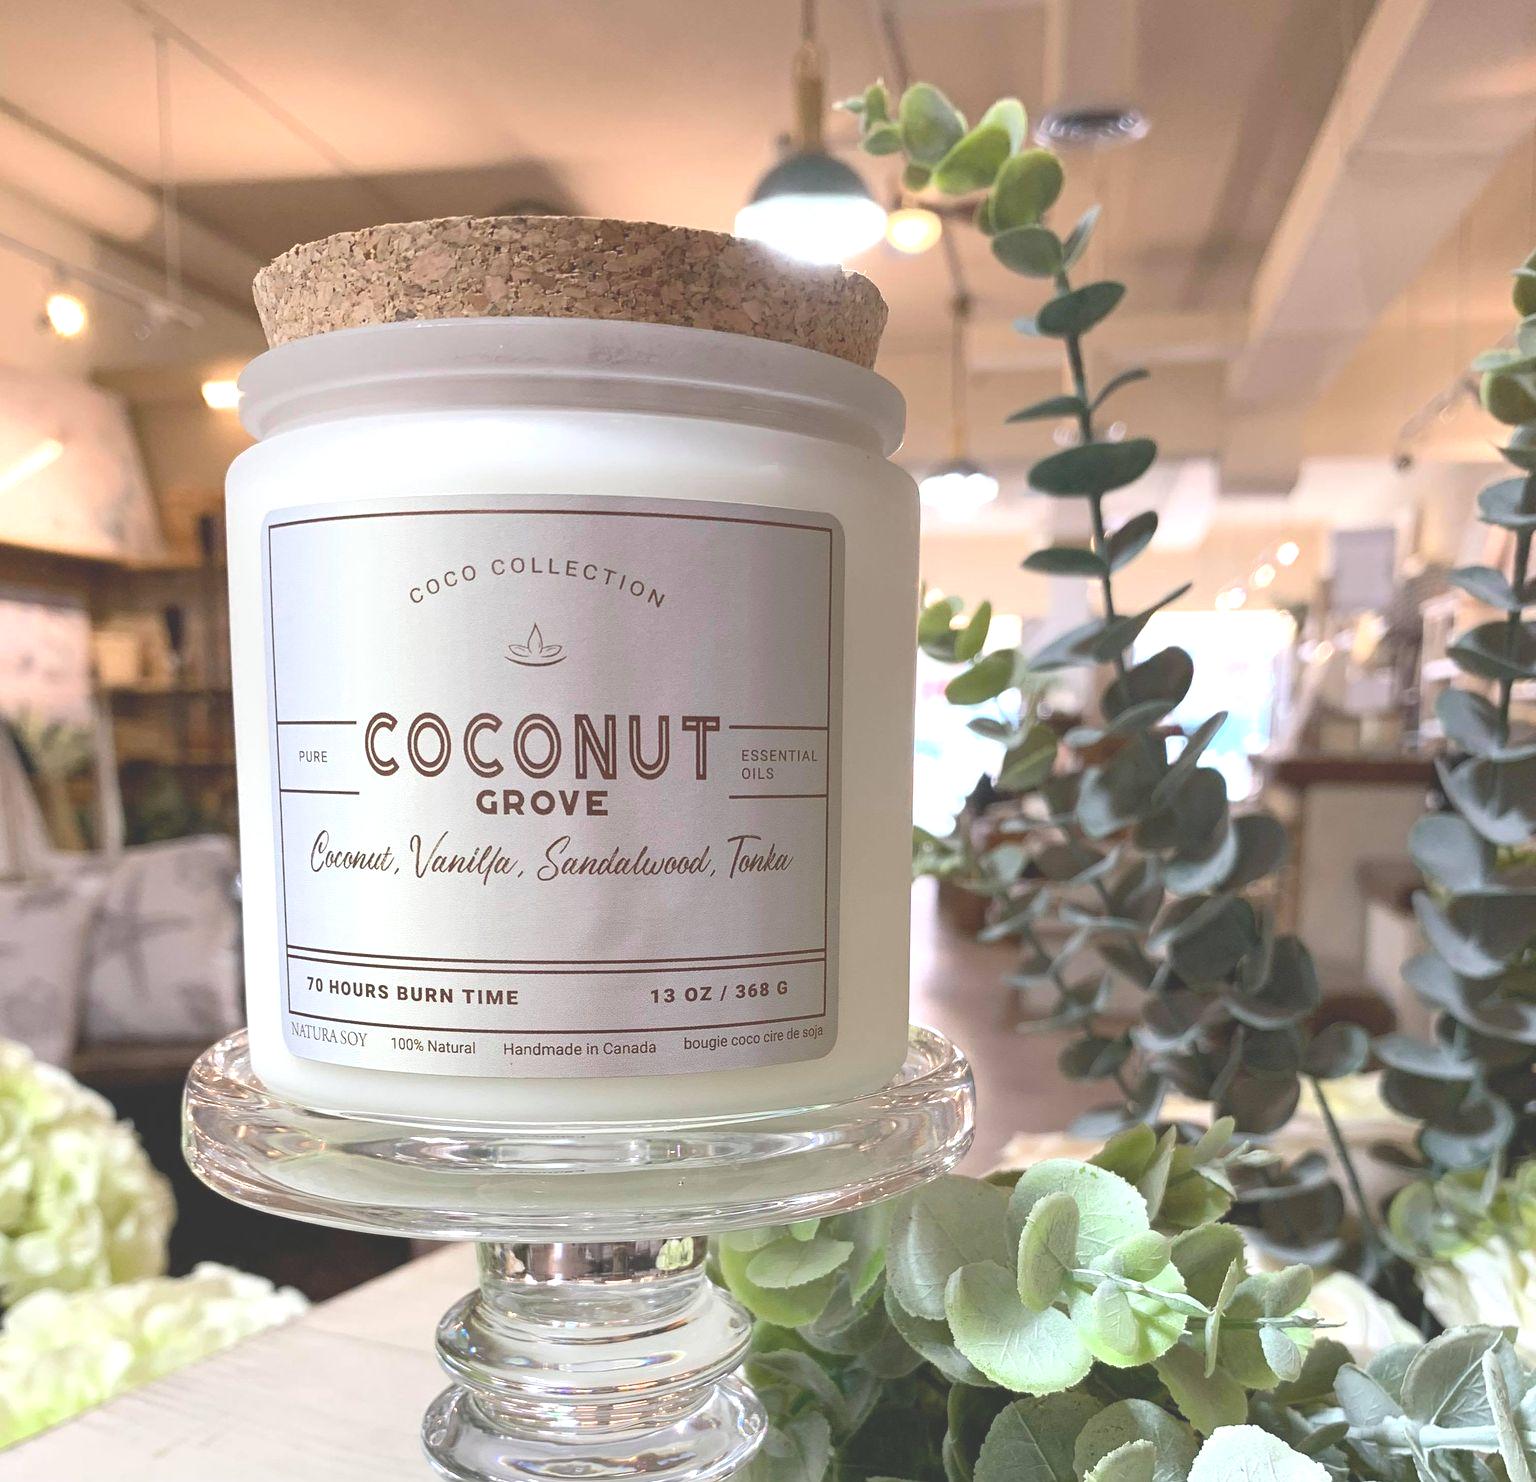 Coconut Grove Coconut, Vanilla, Sandalwood & Tonka